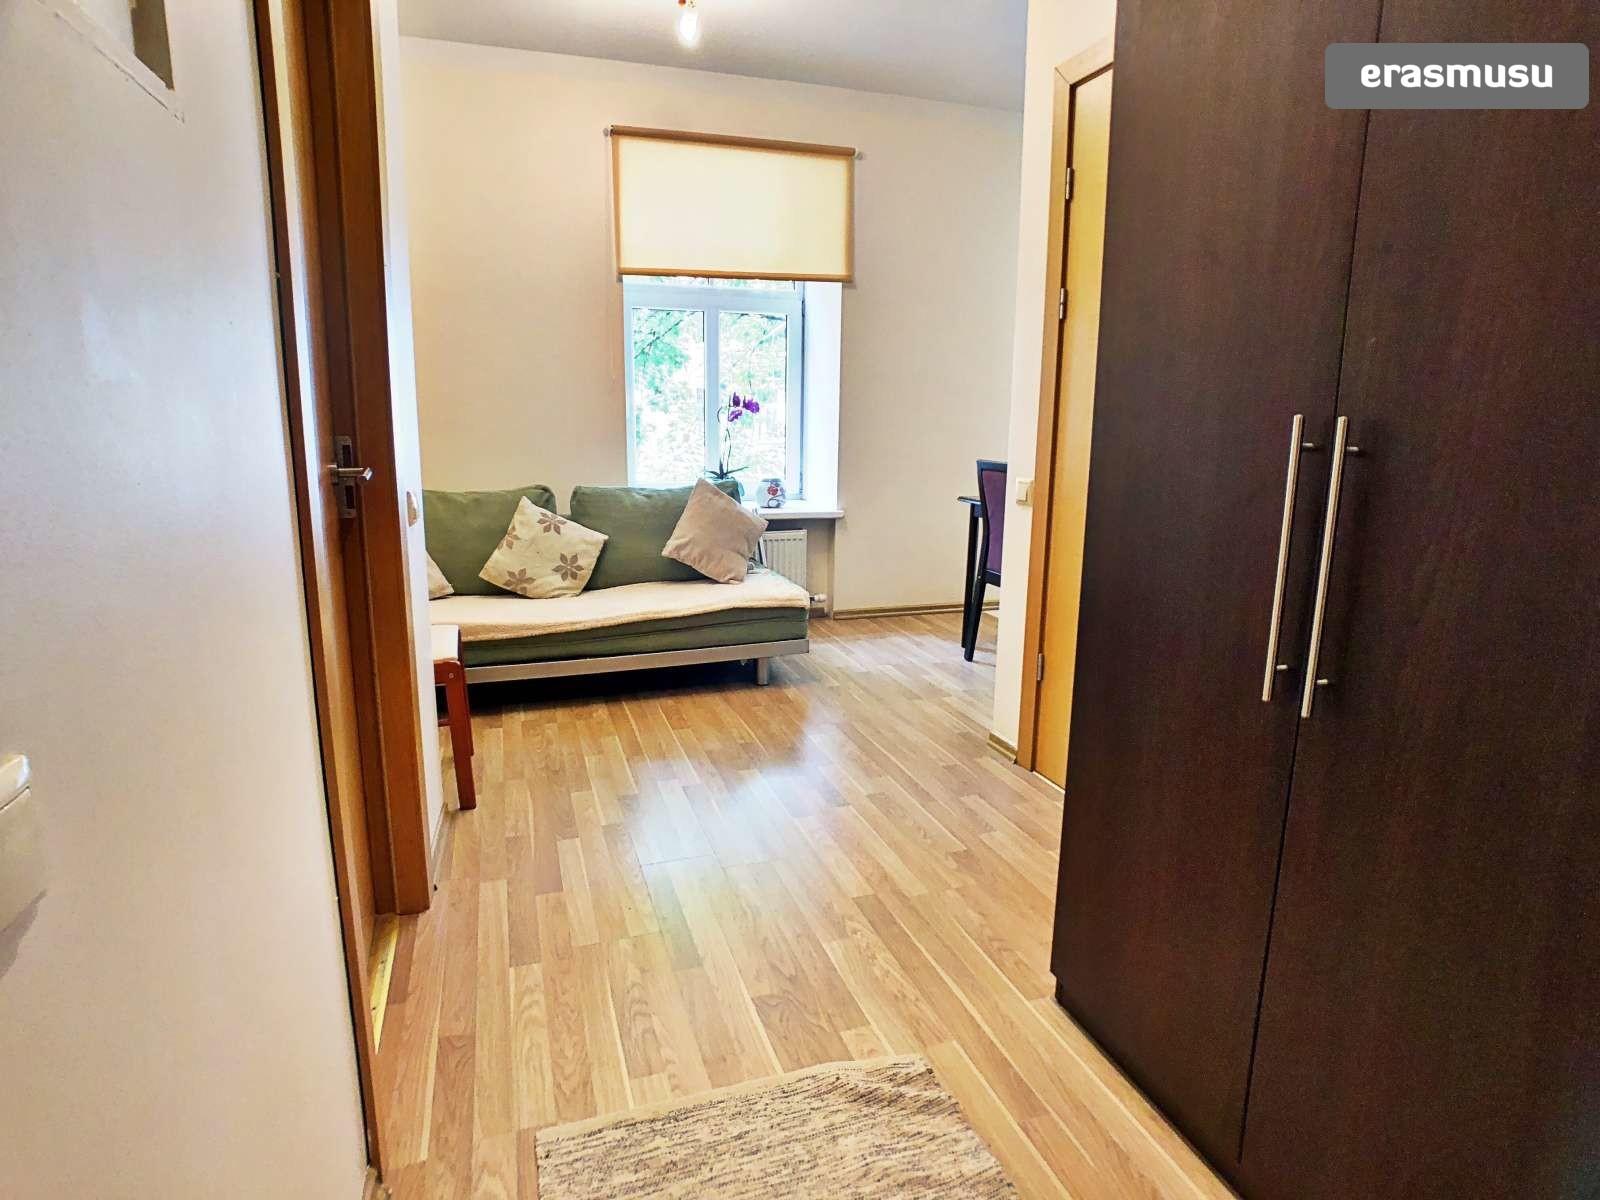 bright-1-bedroom-apartment-rent-maskavas-forstate-7753ff9cc7e2dc